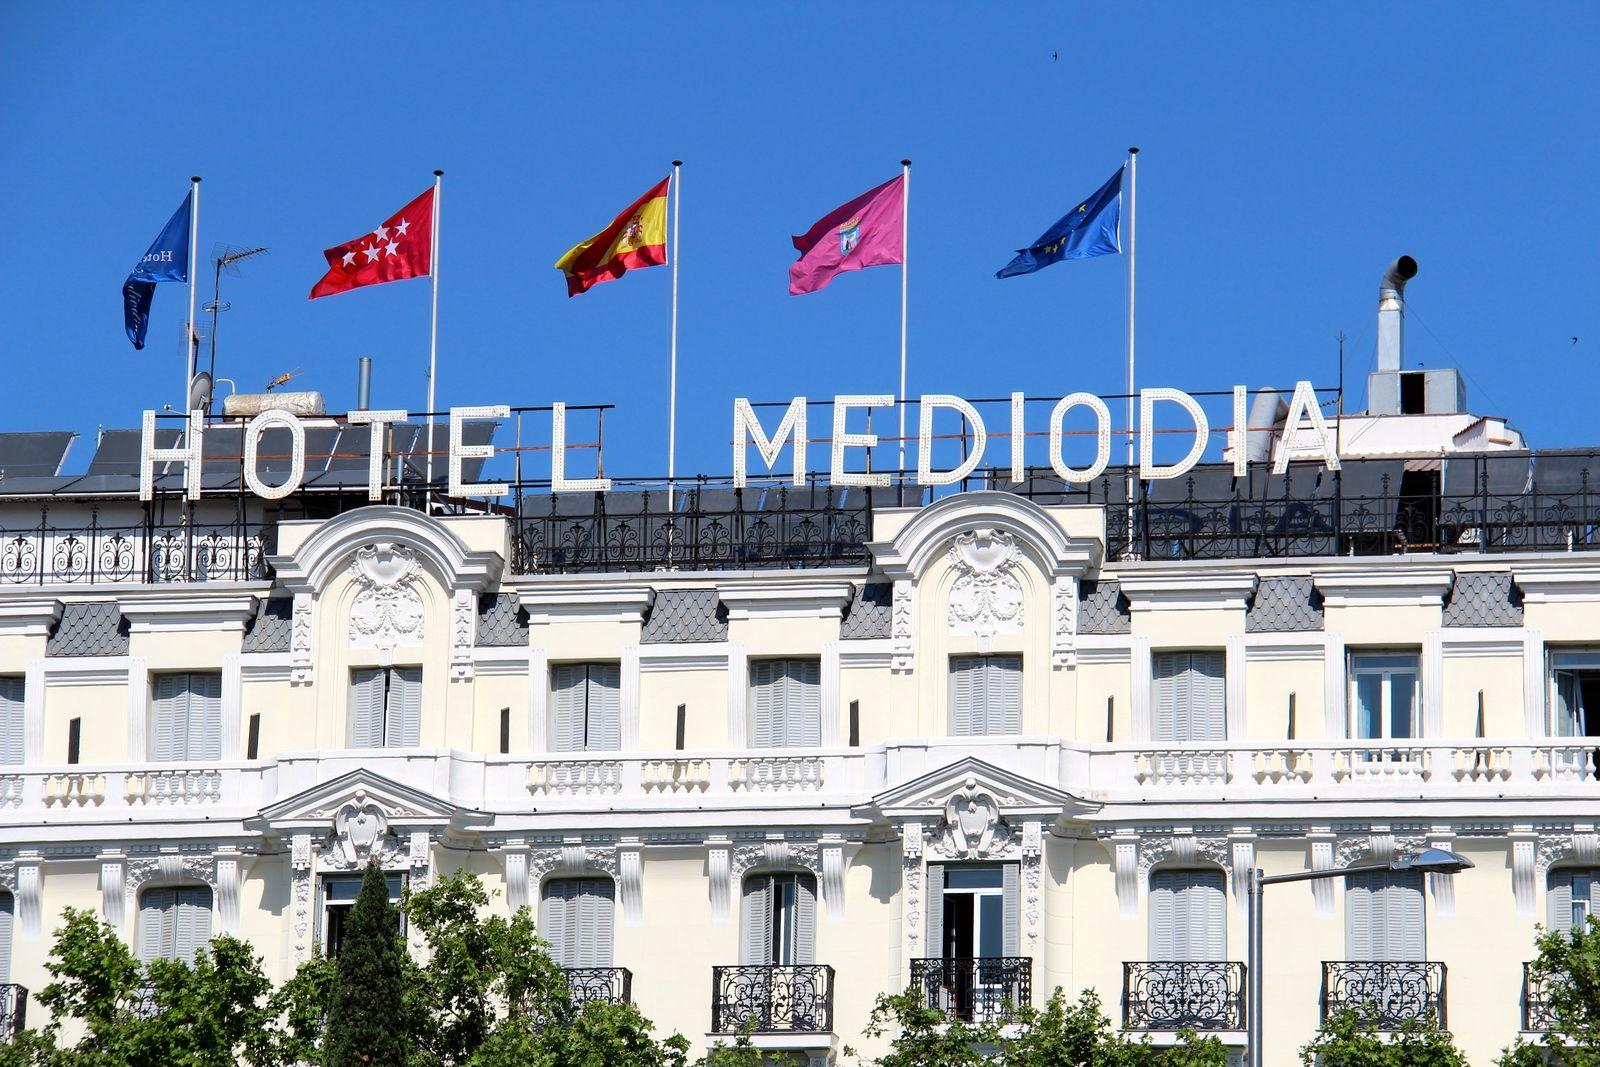 tennis-tourist-madrid-spain-hotel-mediodia-front-of-building-teri-church